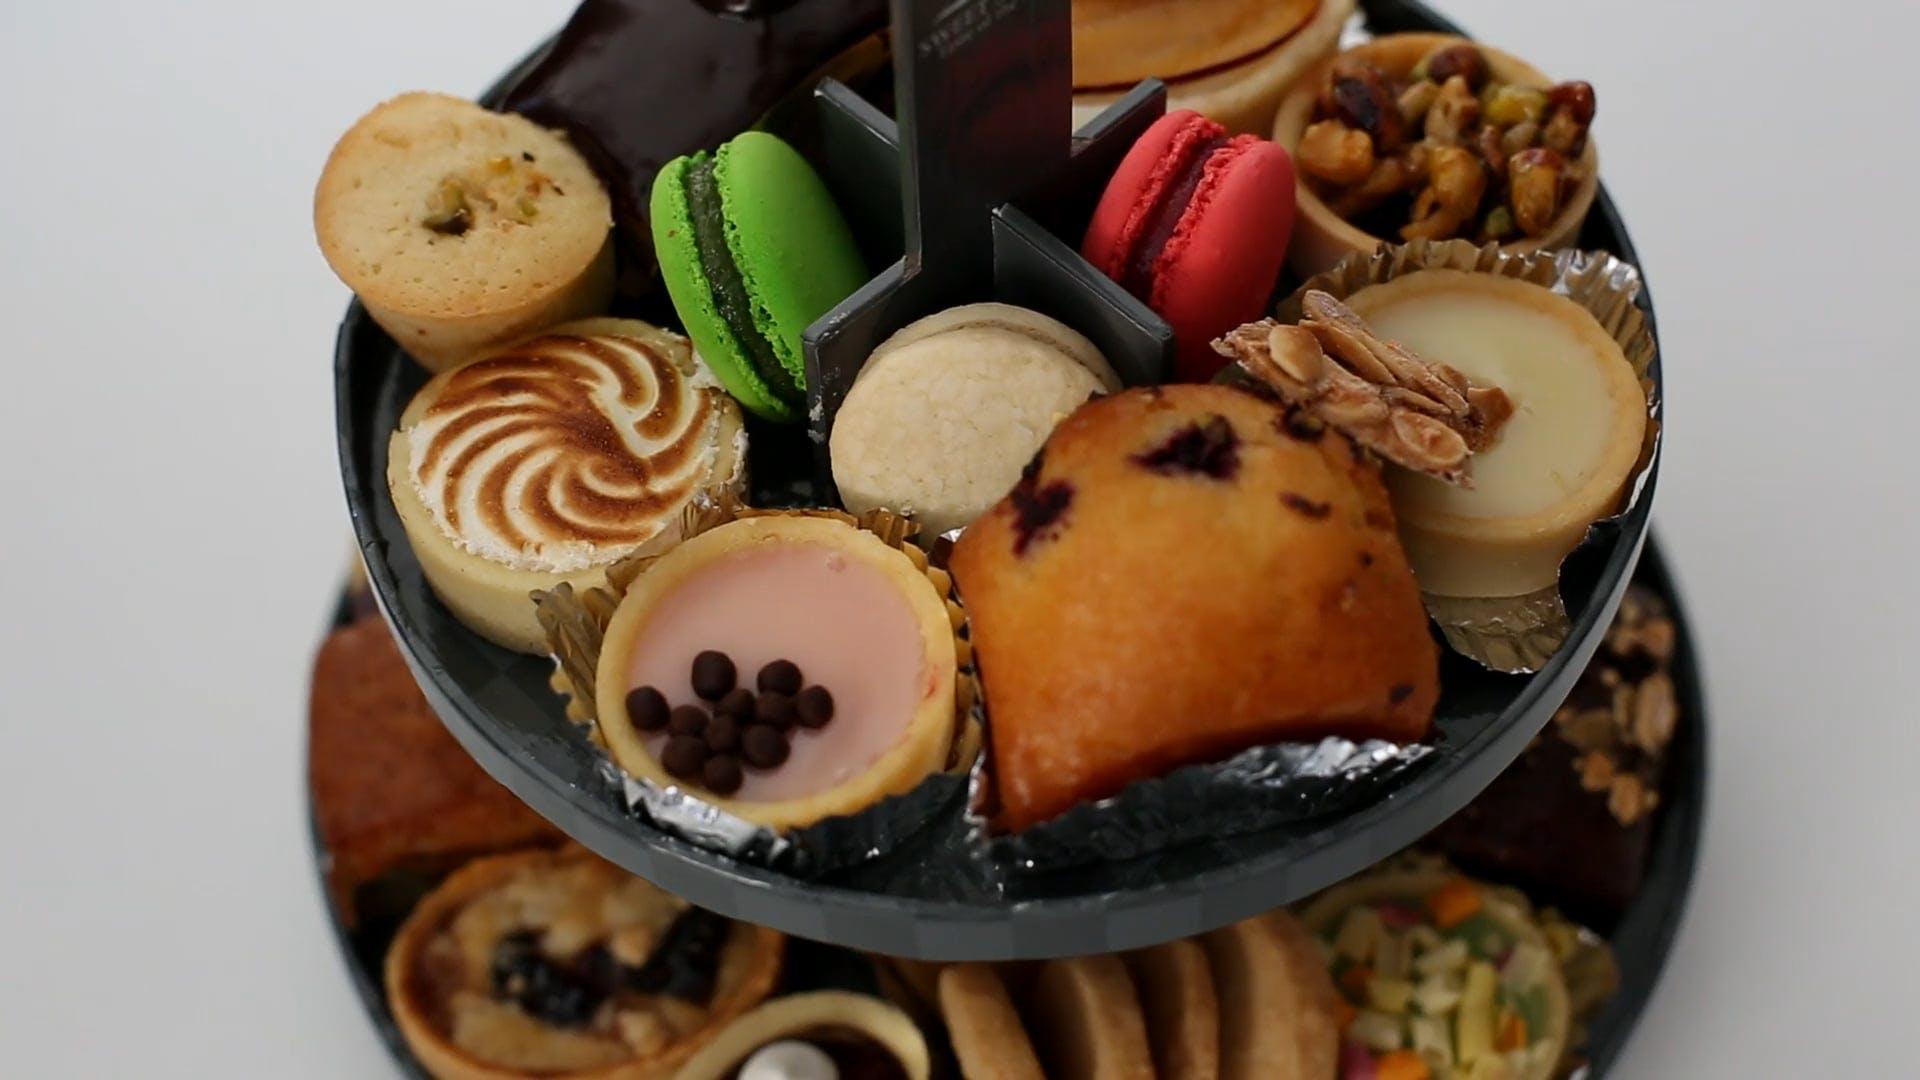 People Grabbing Different Types of Dessert